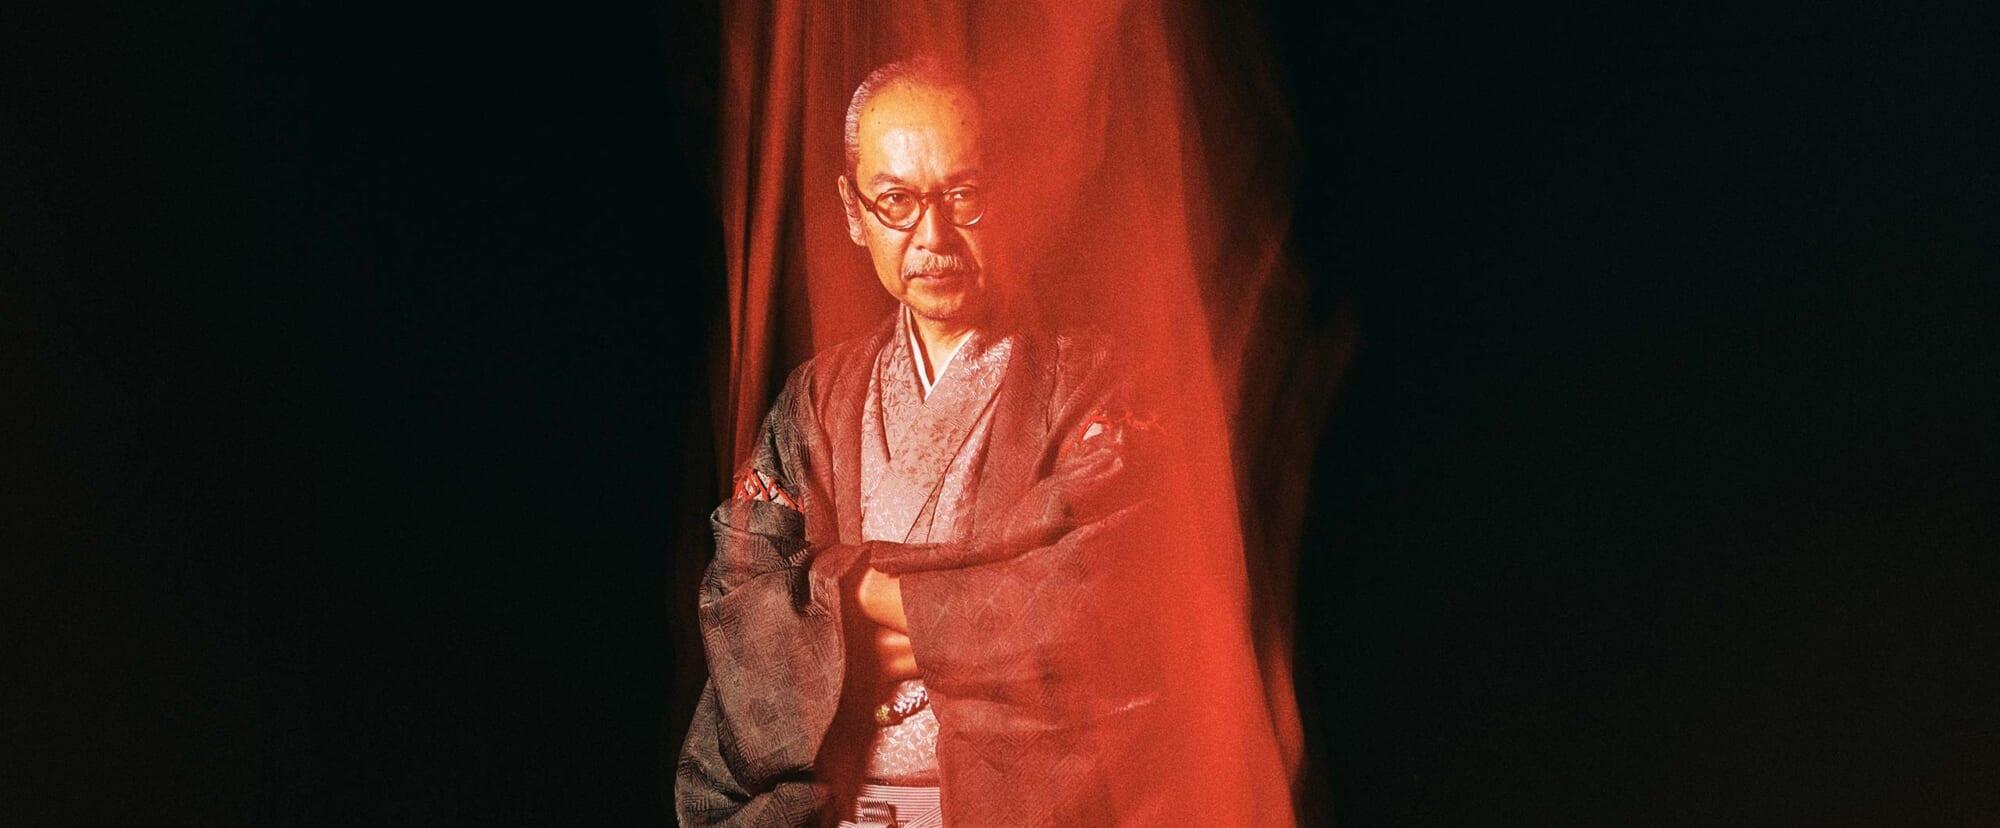 Interview 和嶋慎治(人間椅子)『苦楽』に込めた夜明けの光